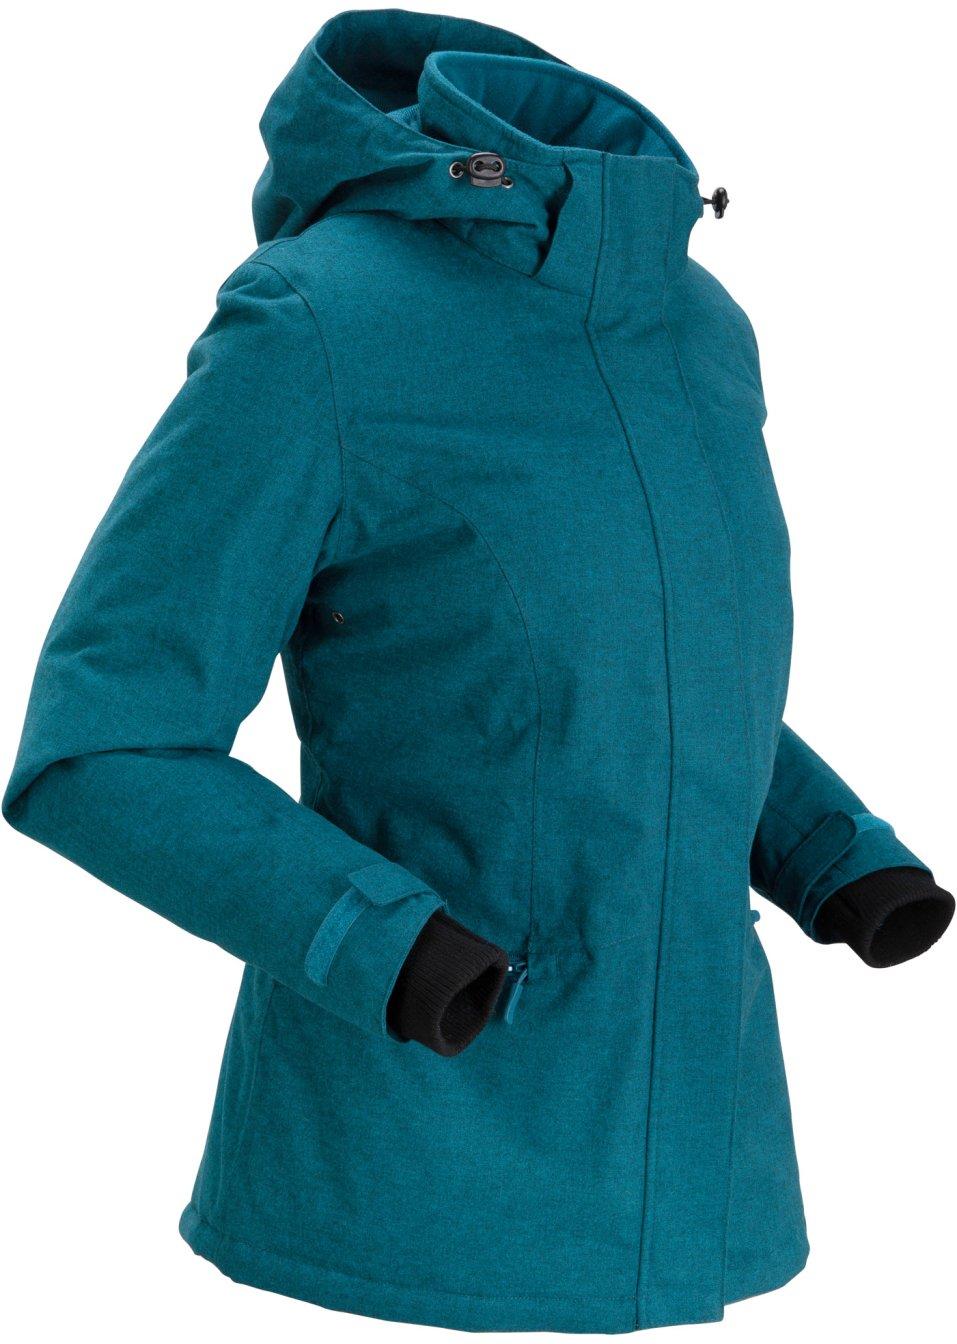 Moderne Outdoorjacke mit abnehmbarer Kapuze - blaupetrol meliert 81TyG KieBl